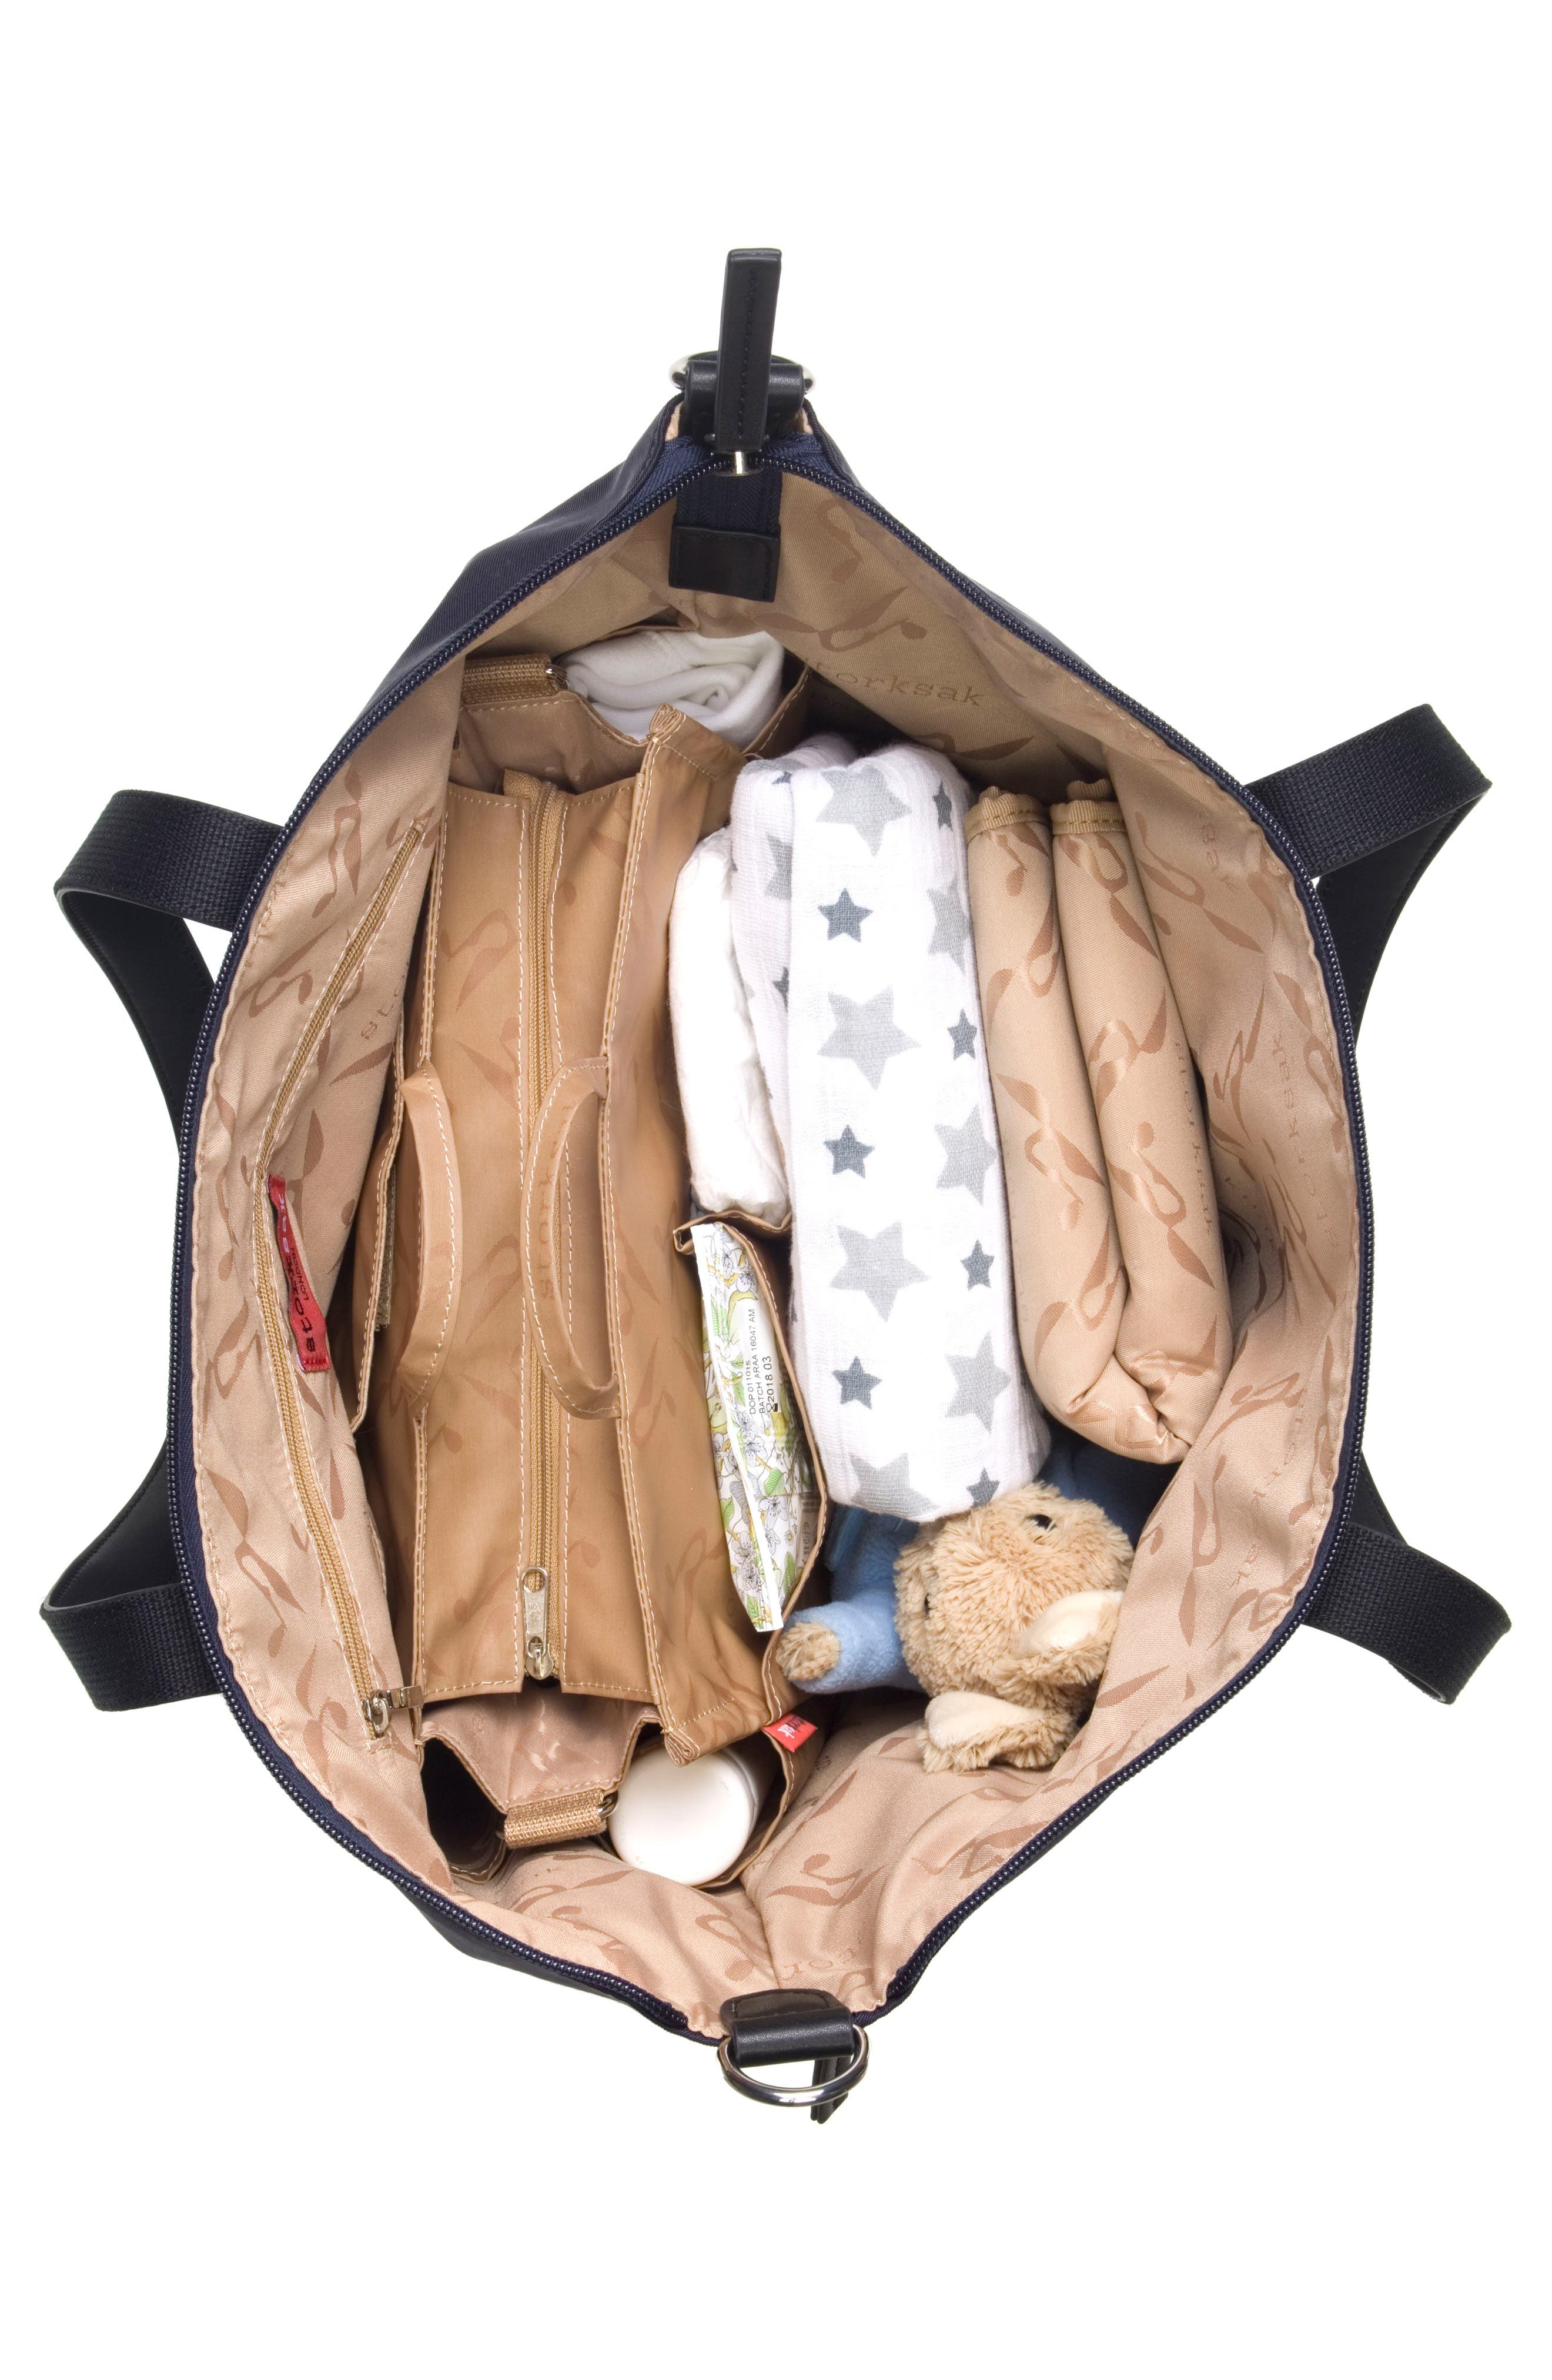 Noa Luxe Diaper Bag,                             Alternate thumbnail 2, color,                             410